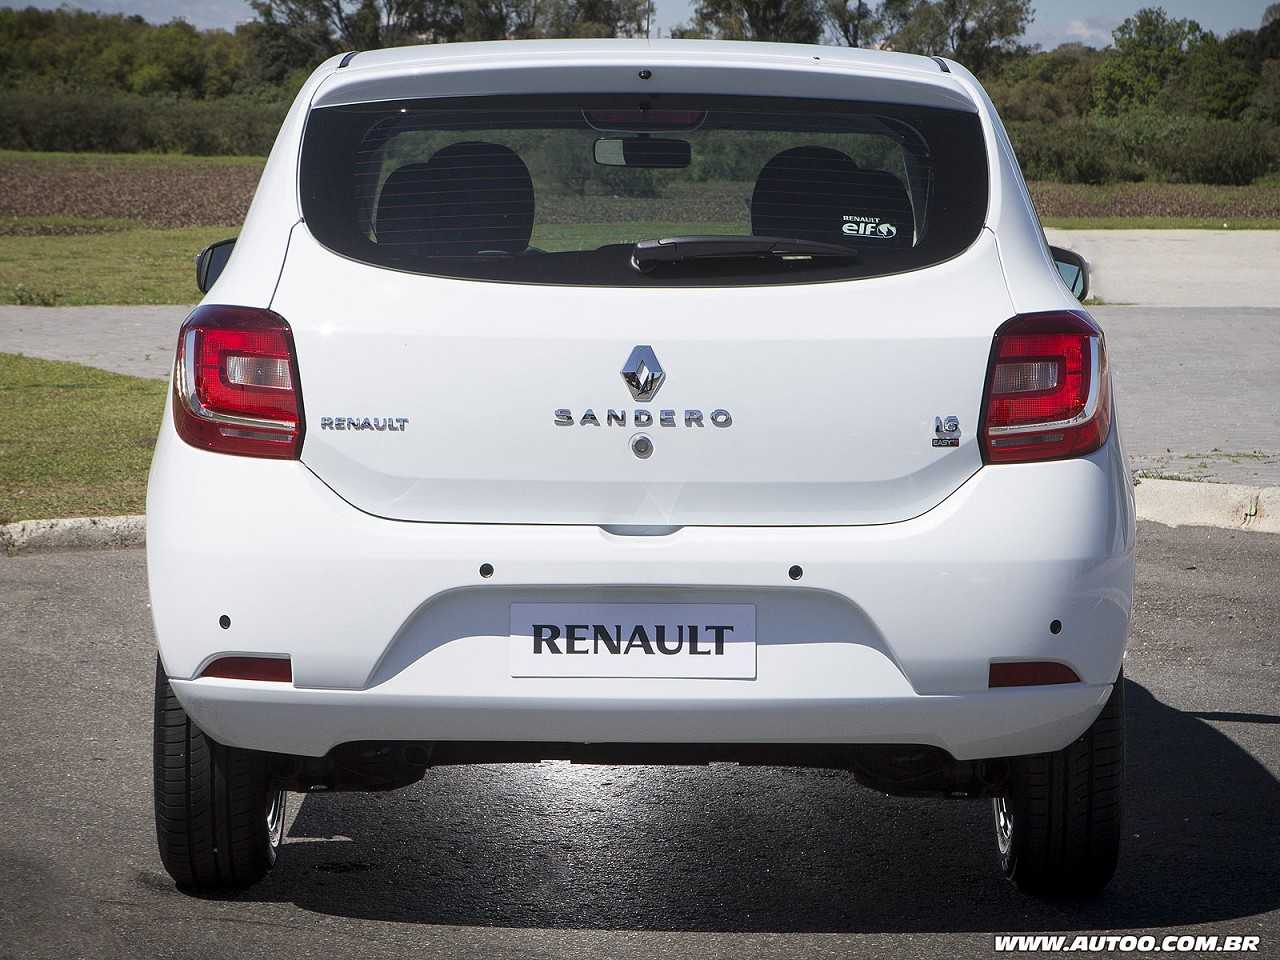 RenaultSandero 2017 - traseira